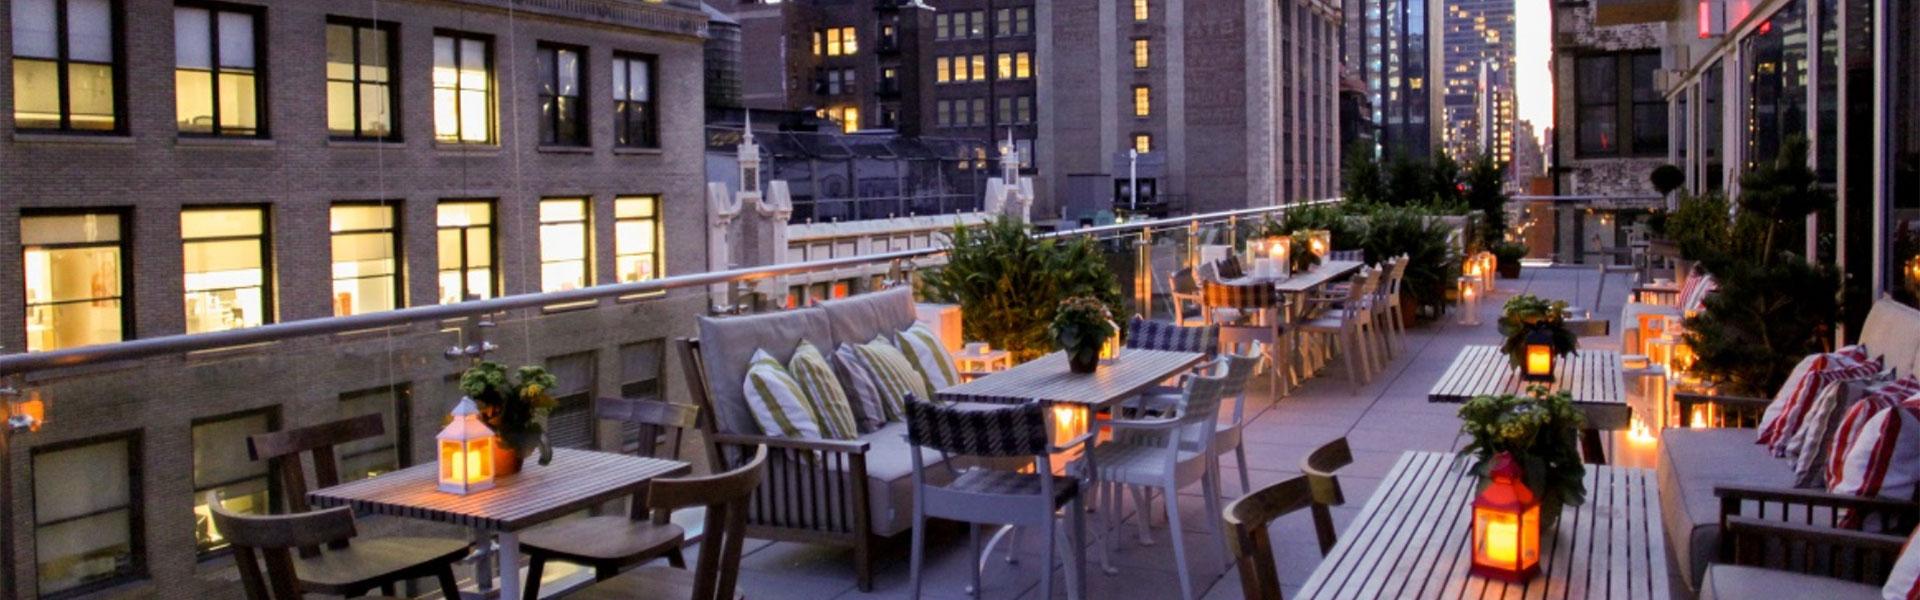 Mondrian Terrace NYC restaurant